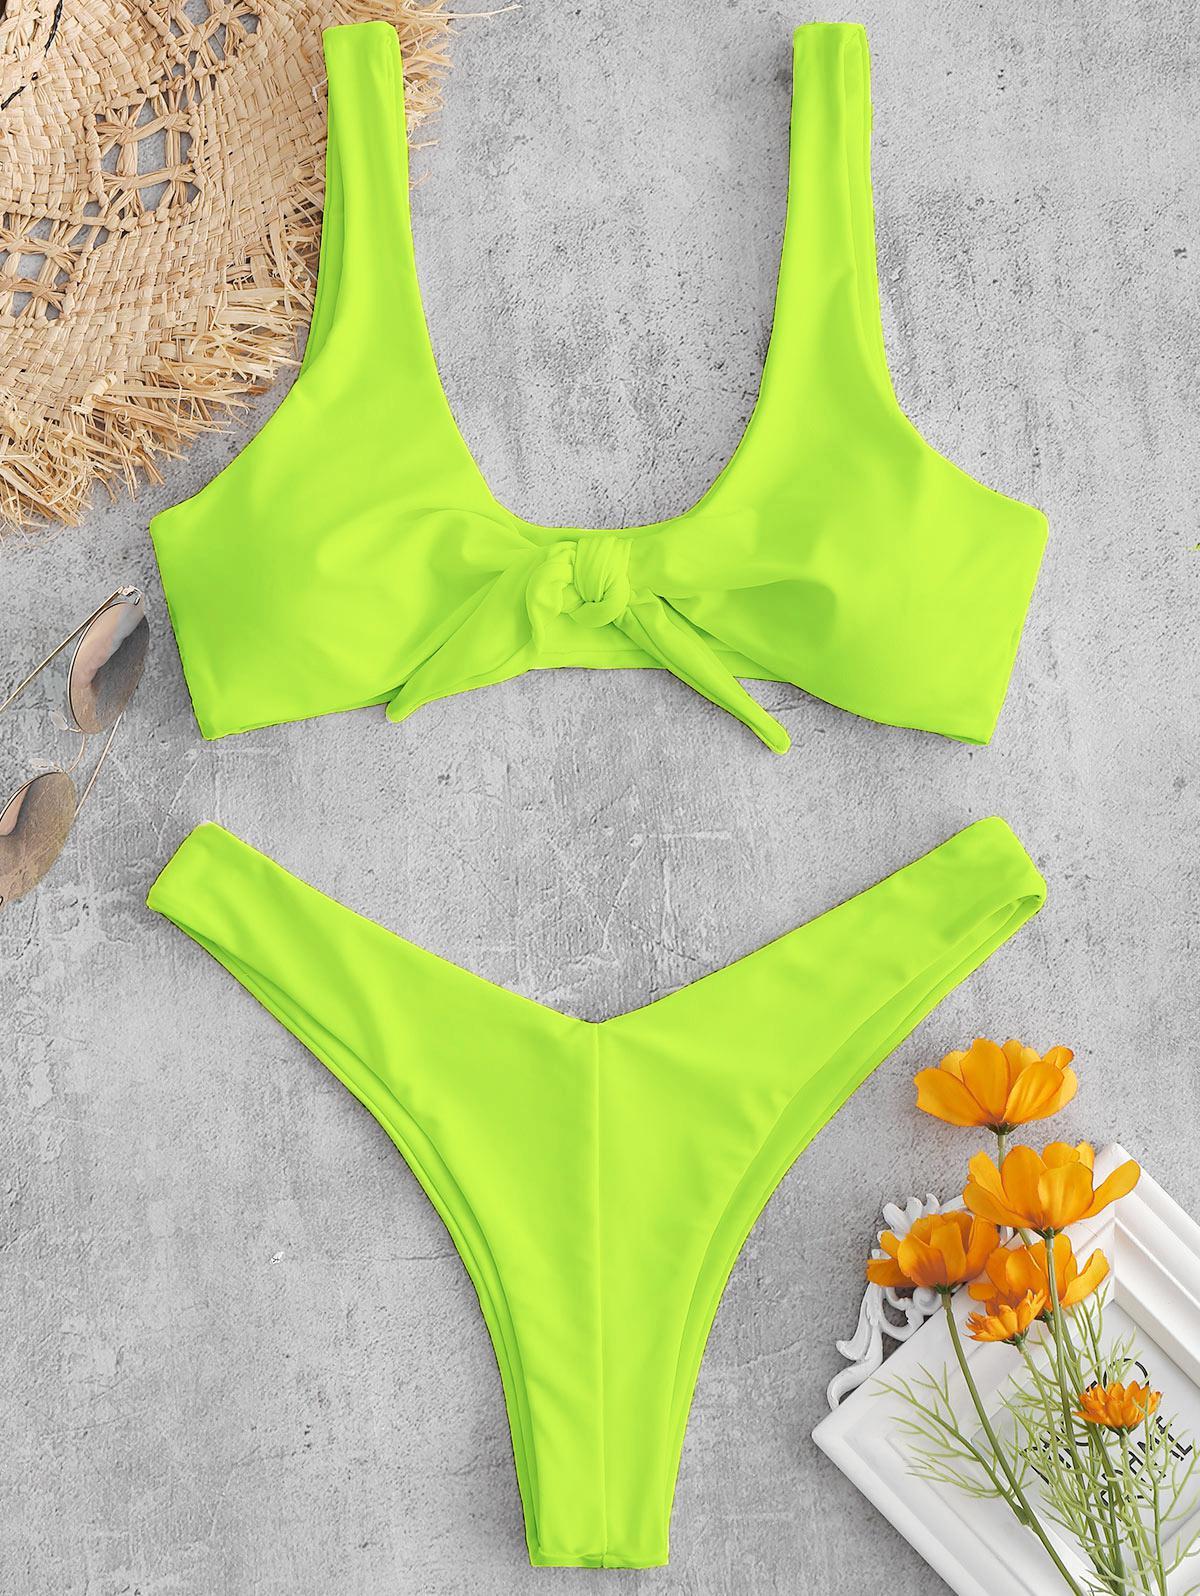 ZAFUL Tie Front High Leg Tank Bikini Swimsuit, Green yellow